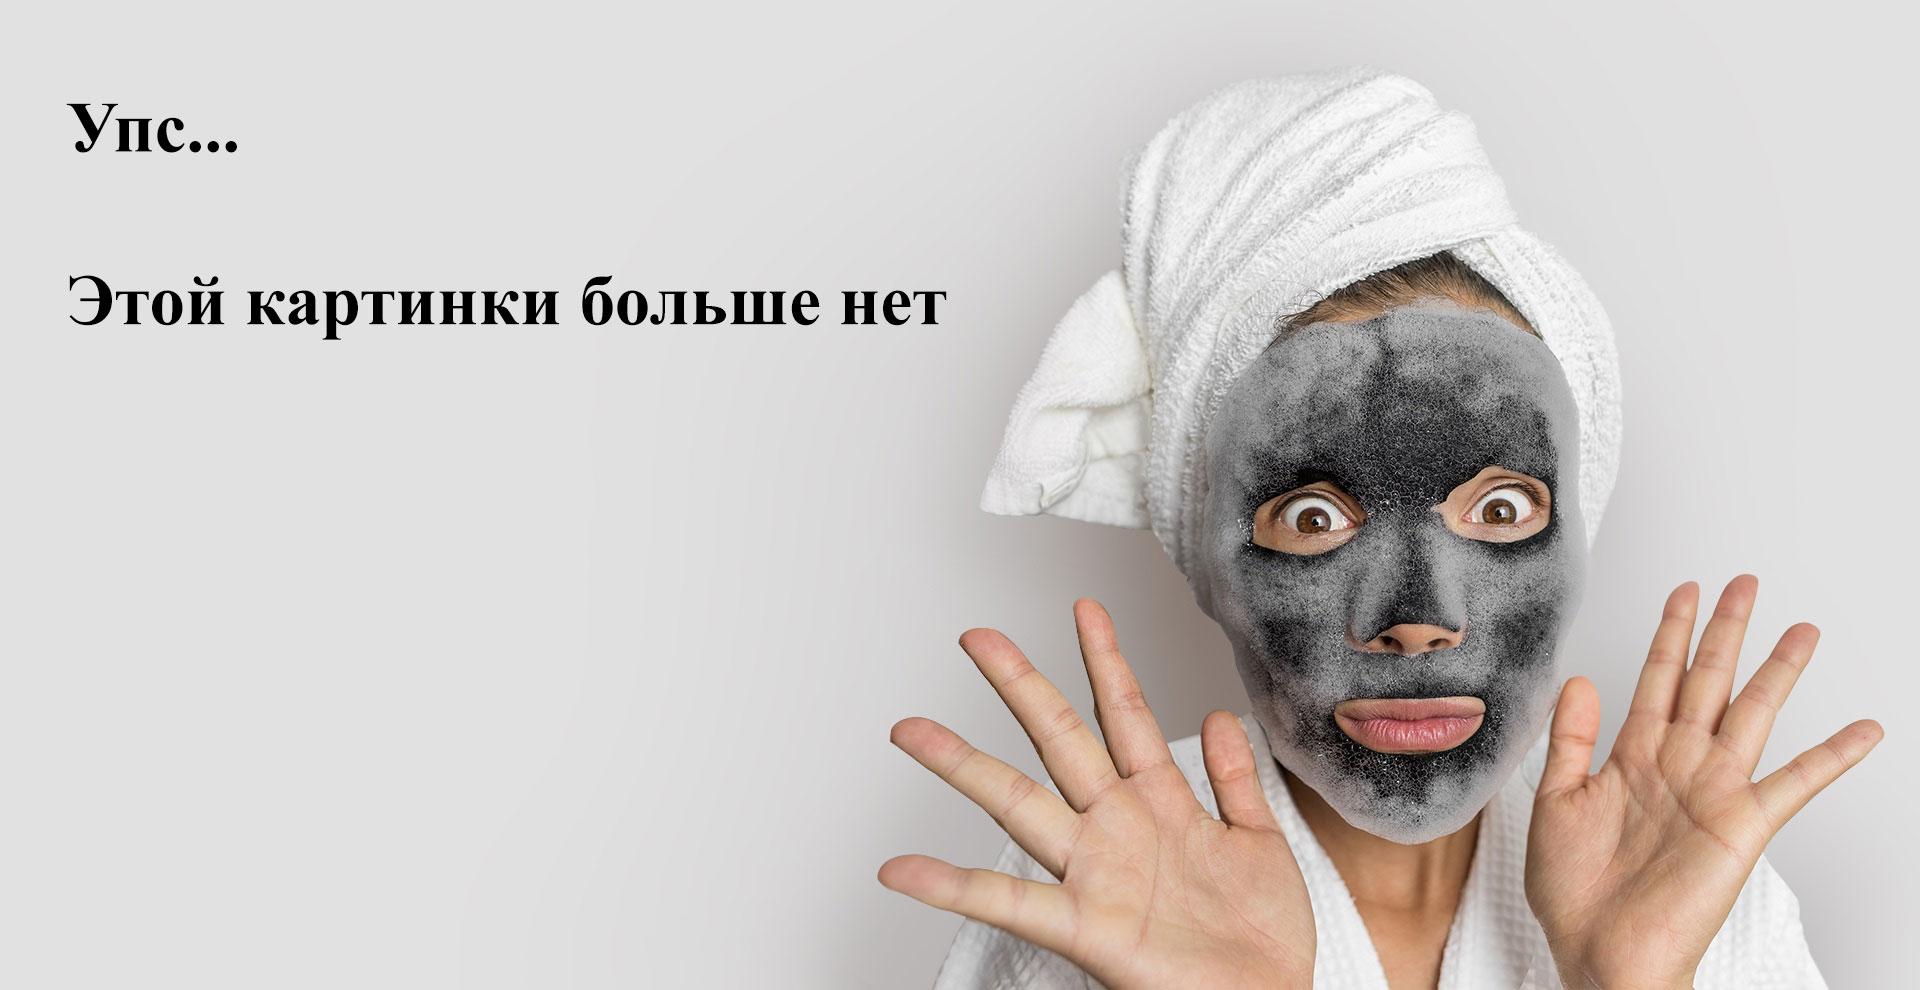 Nice Day, Бальзам-йогурт для волос «Крапива», 250 мл (УЦЕНКА)